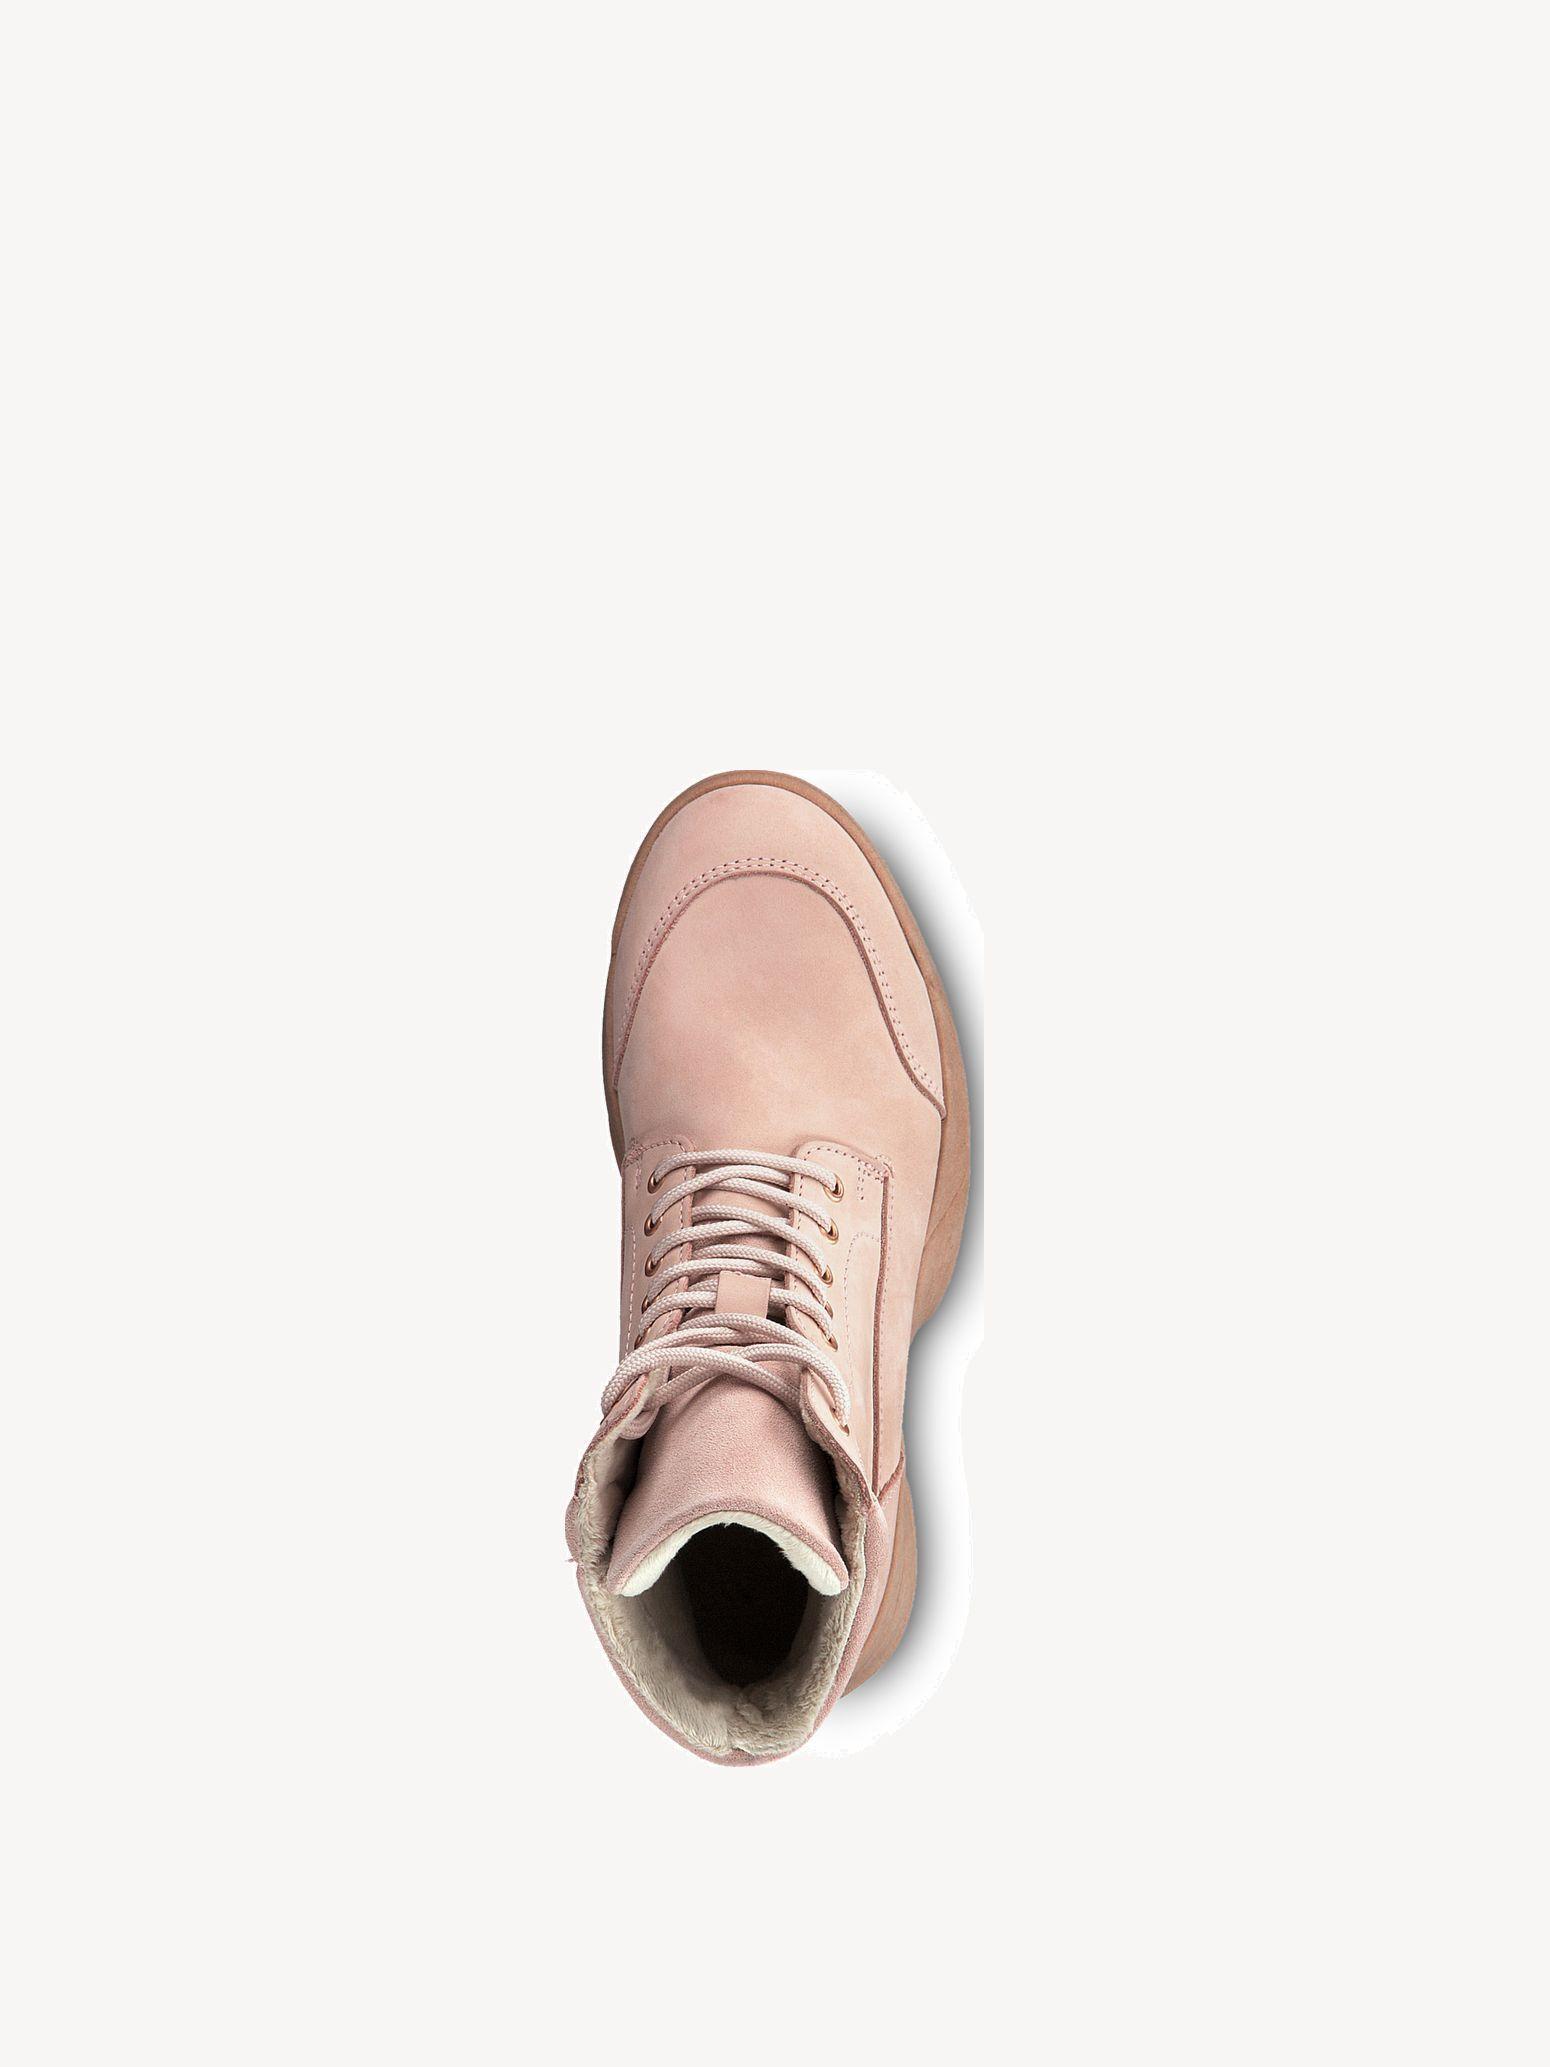 Hiking Boots TAMARIS 1 25710 31 Light Pink 526